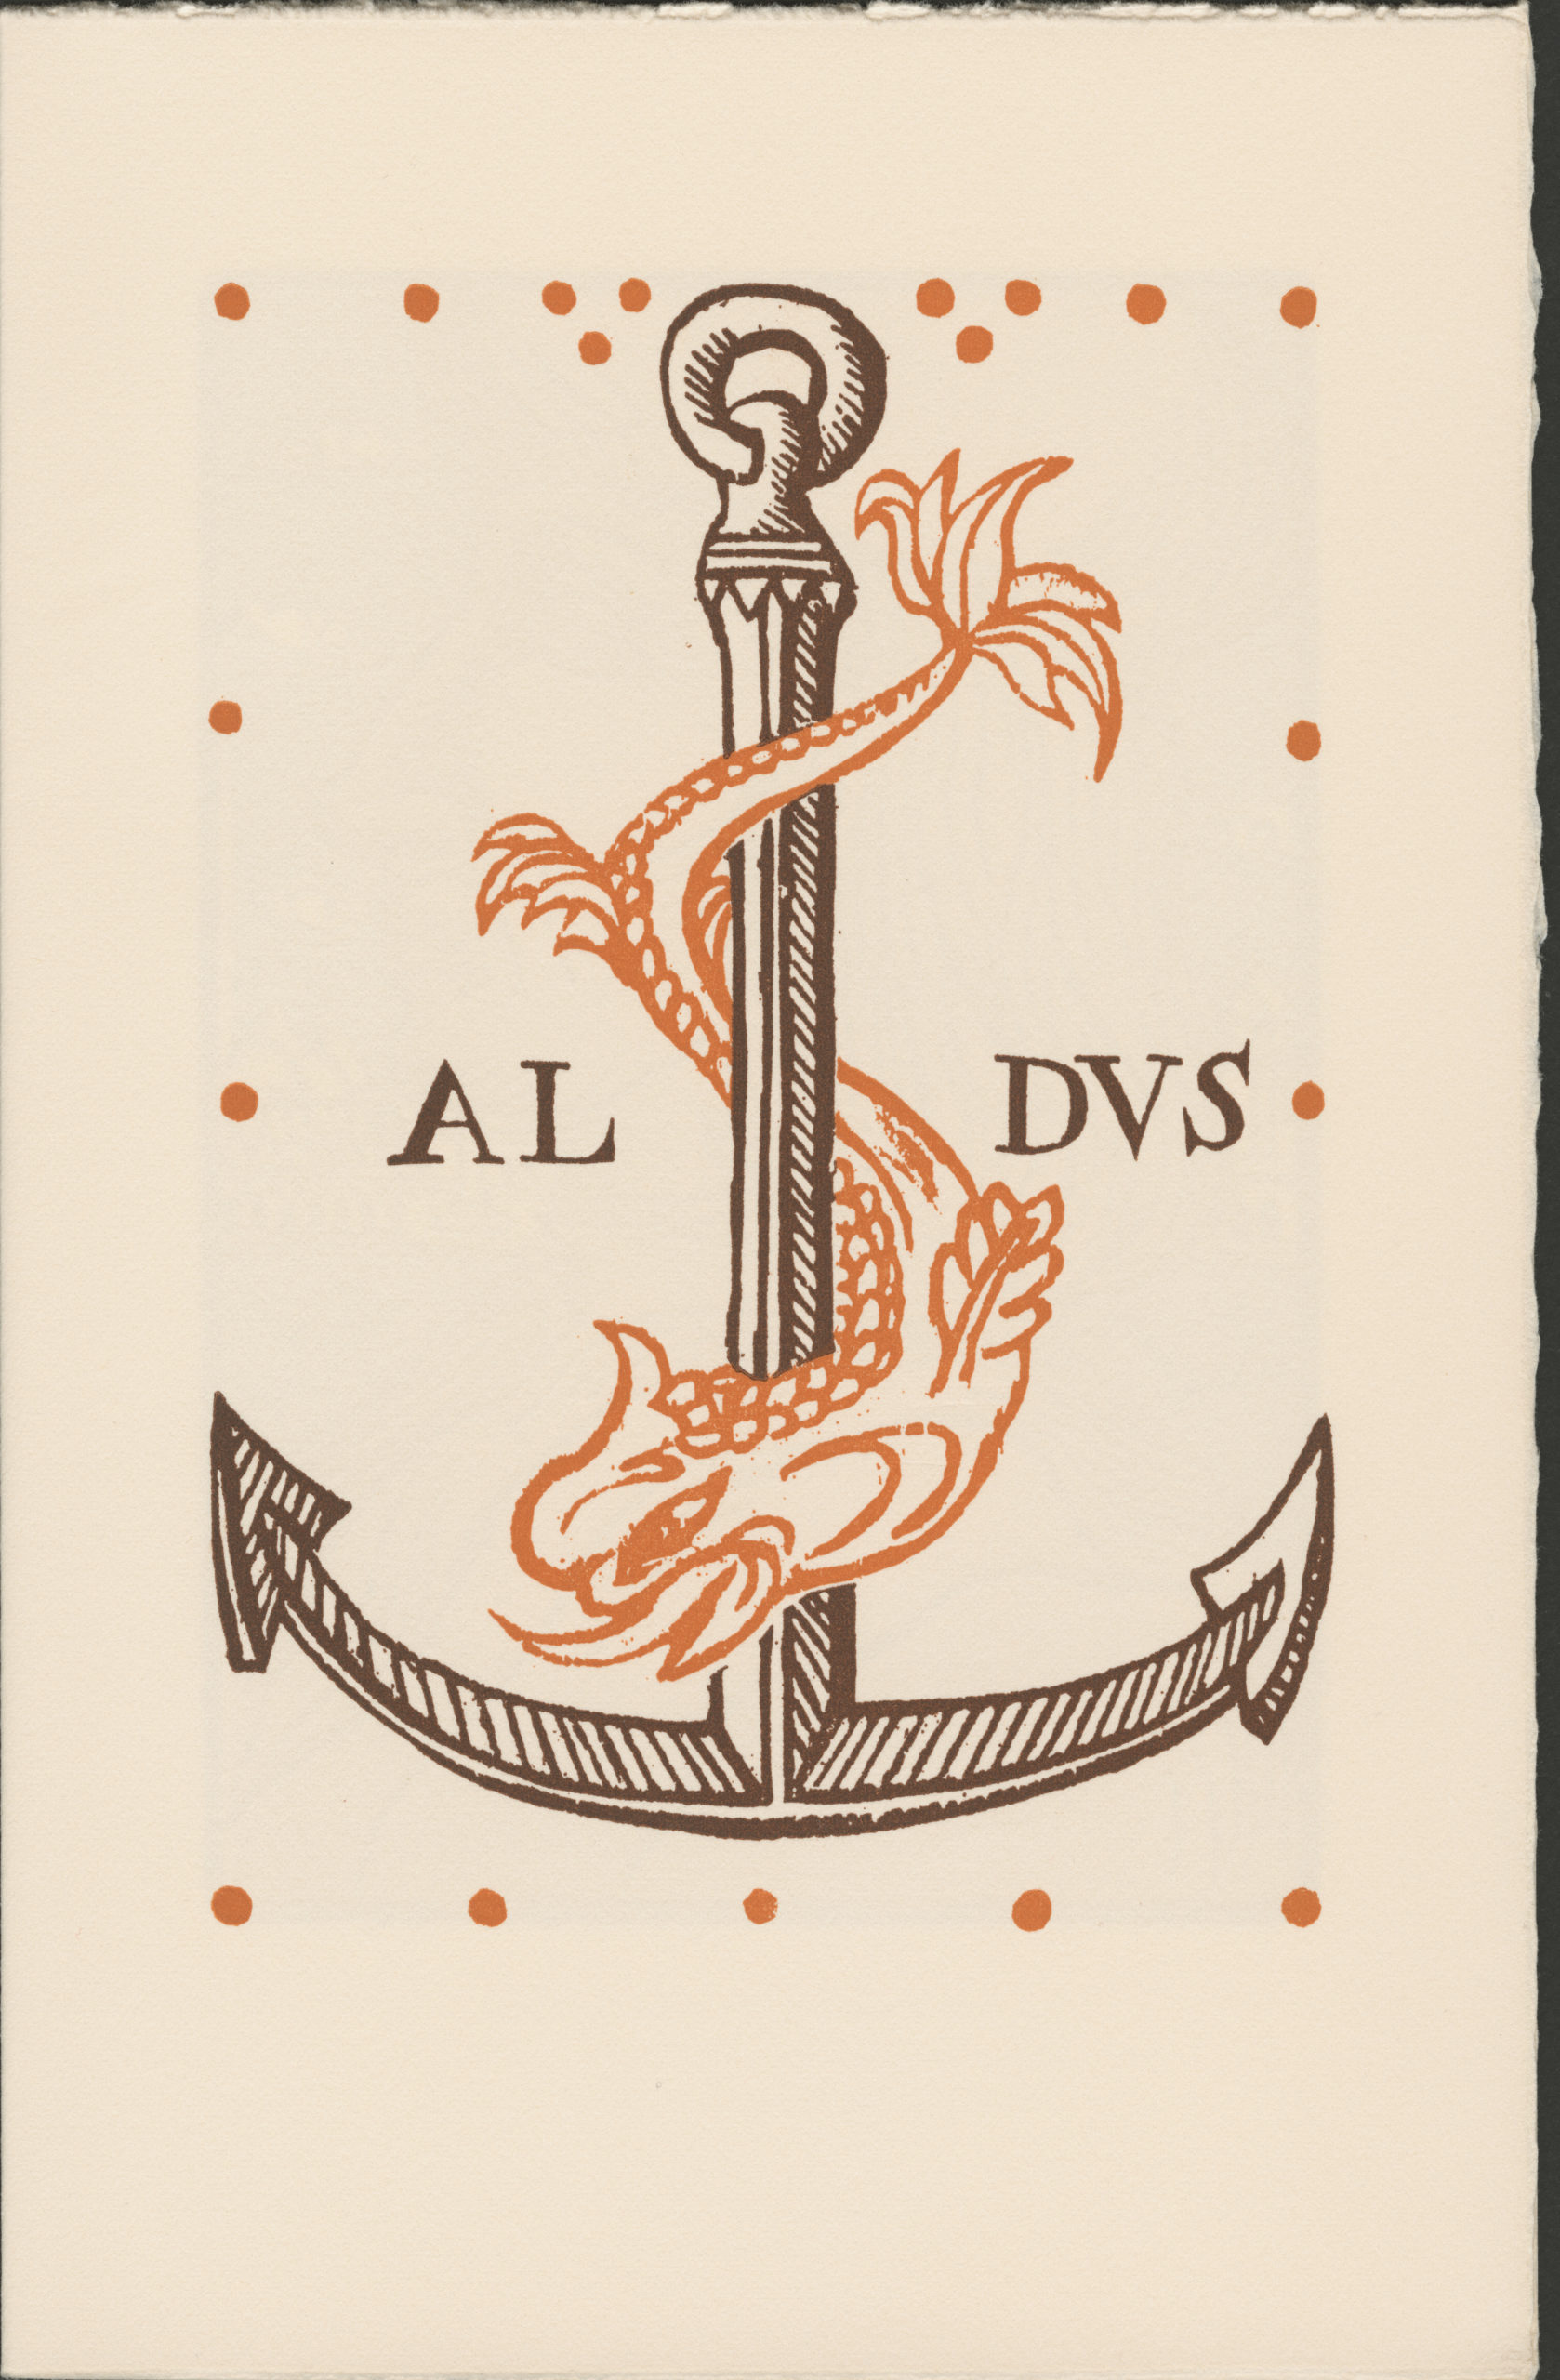 AldineDevice-1